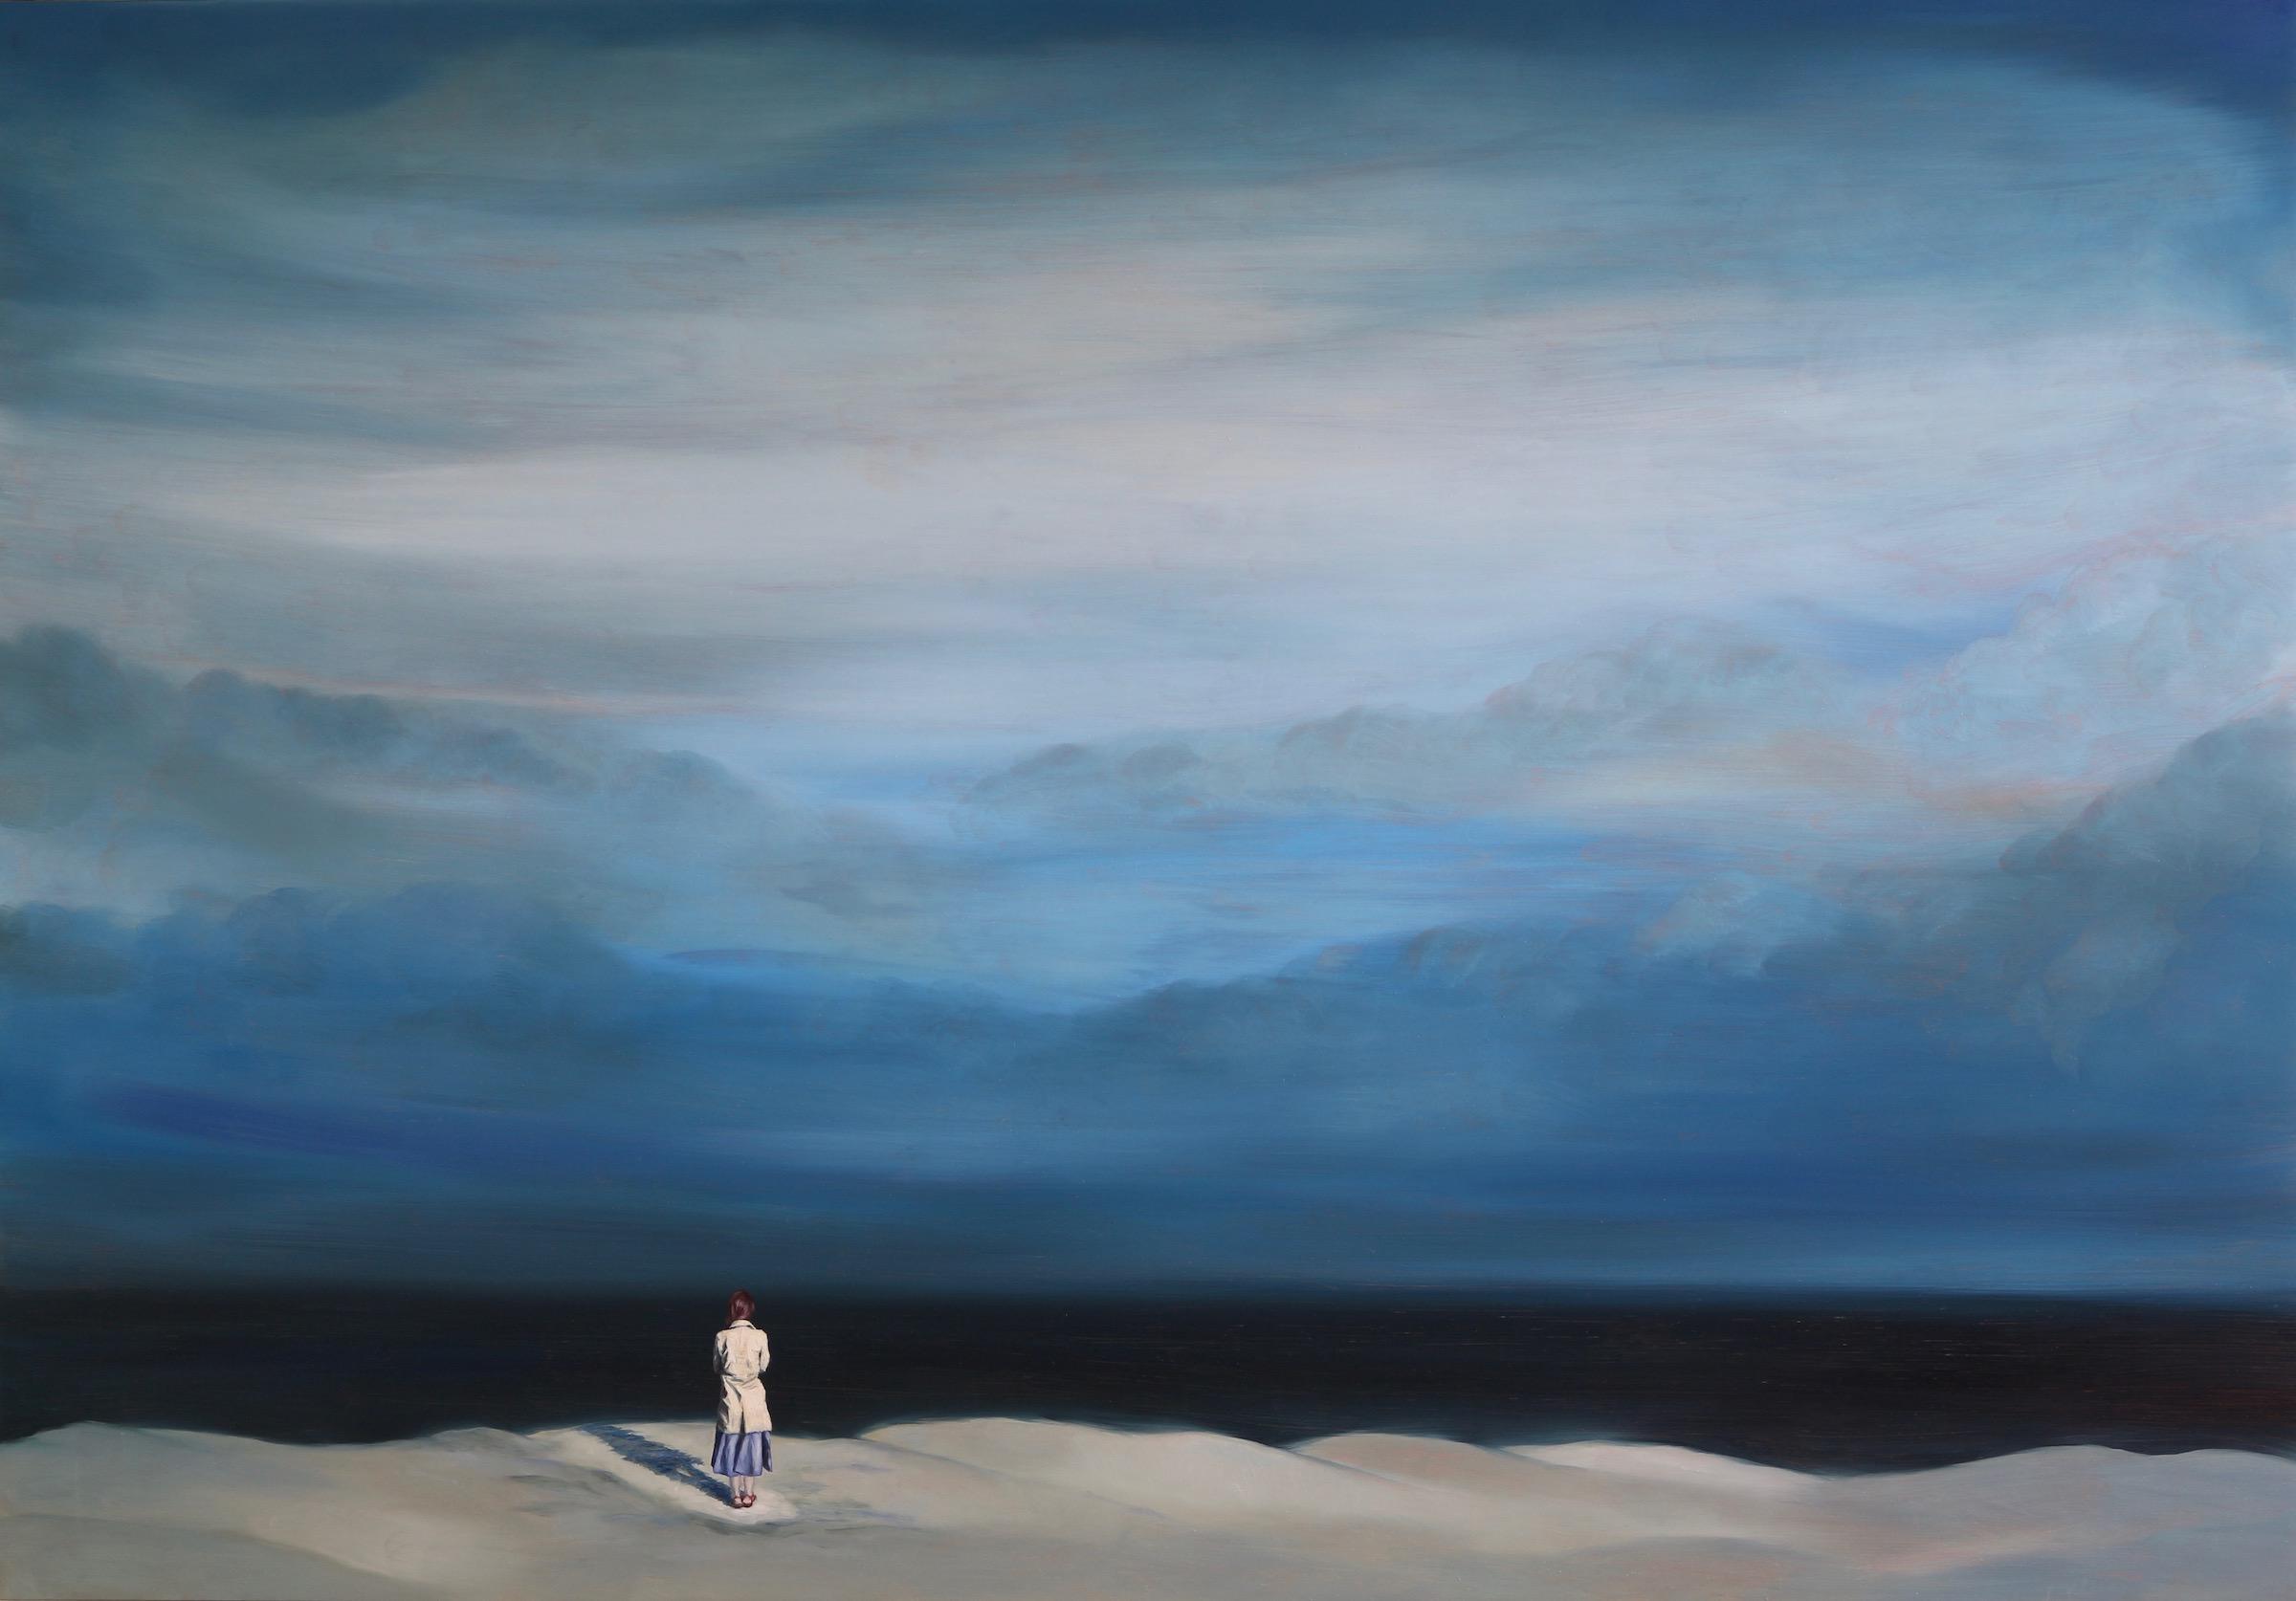 The Silent Sea, Oil on wood panel, 70x100cm, 2017